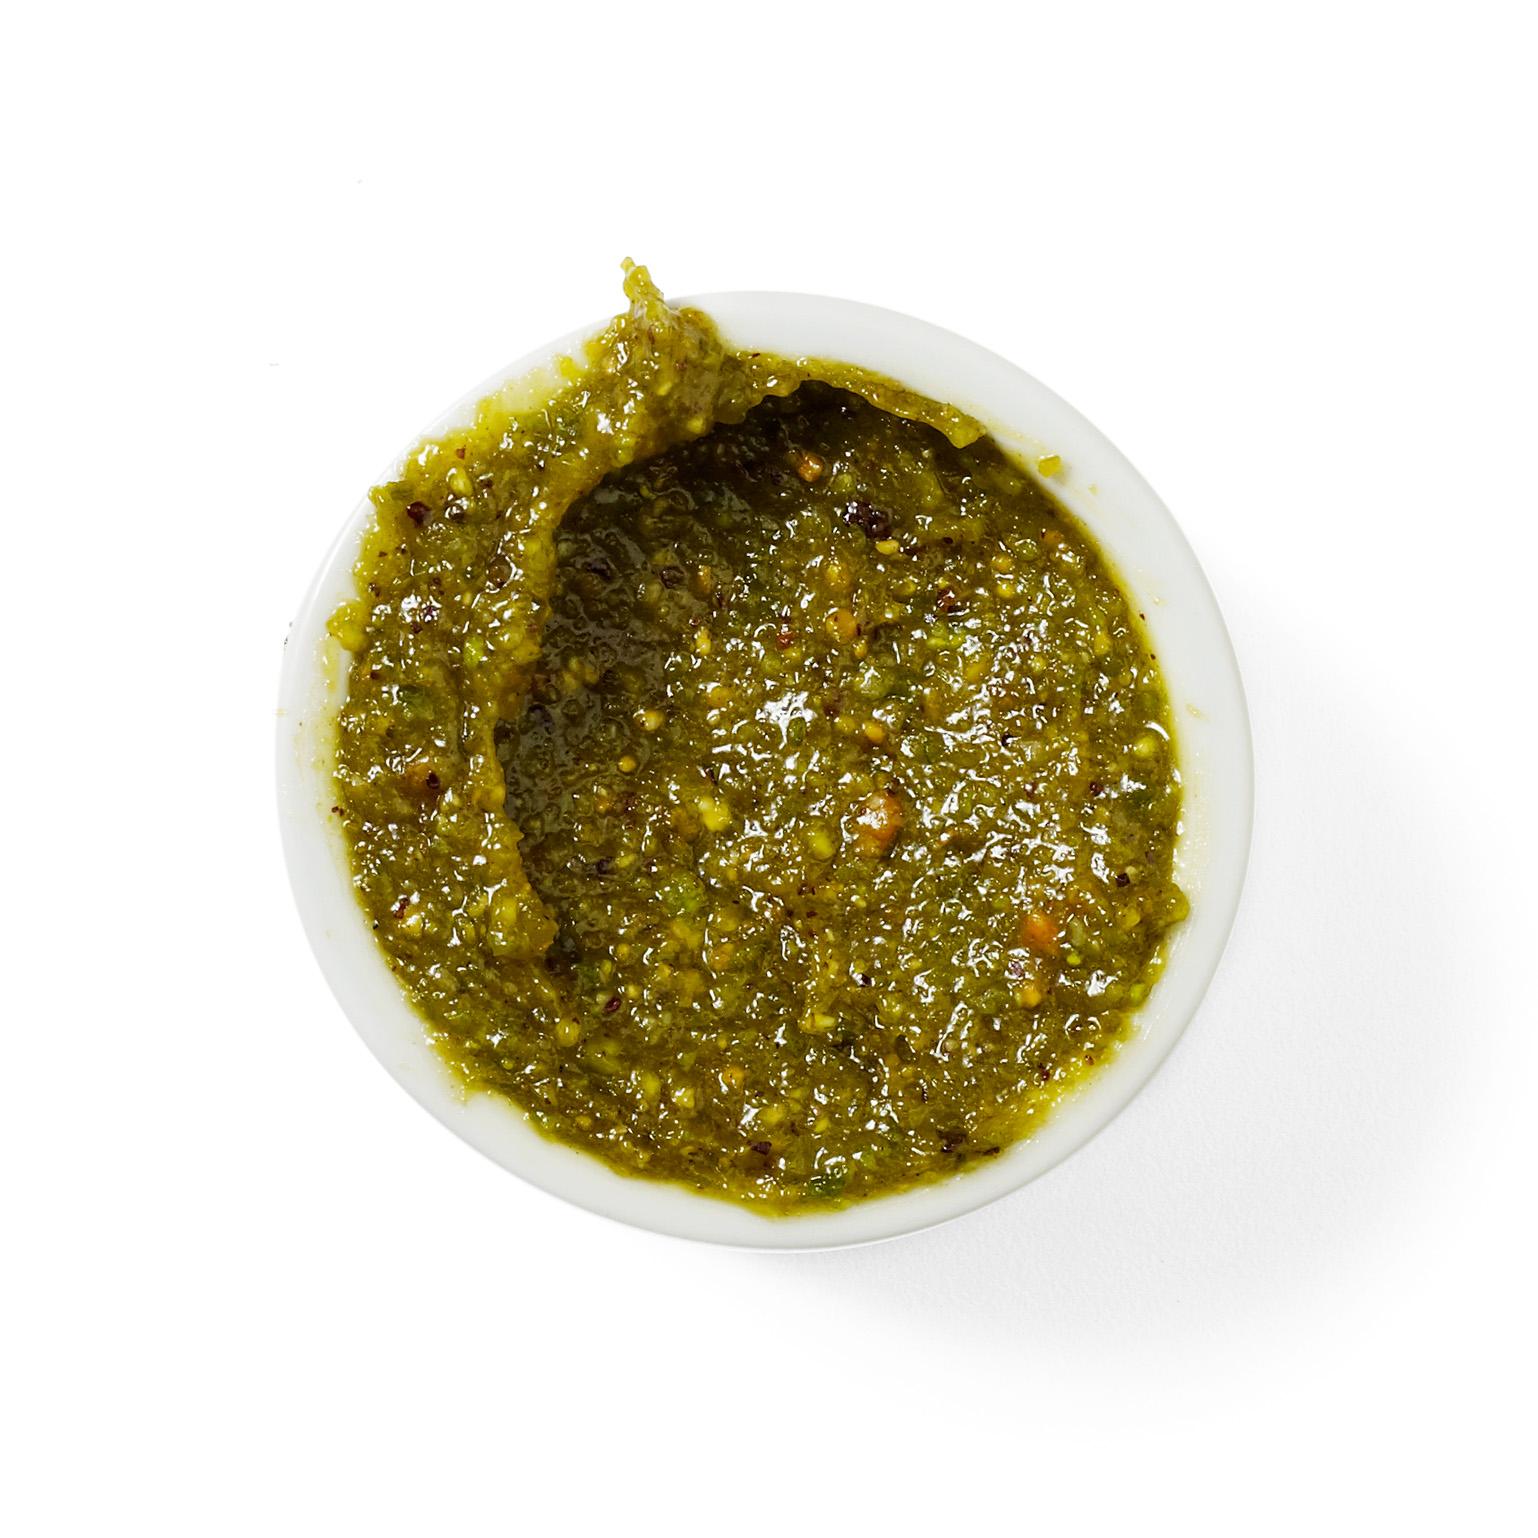 Pistachio-Honey Butter